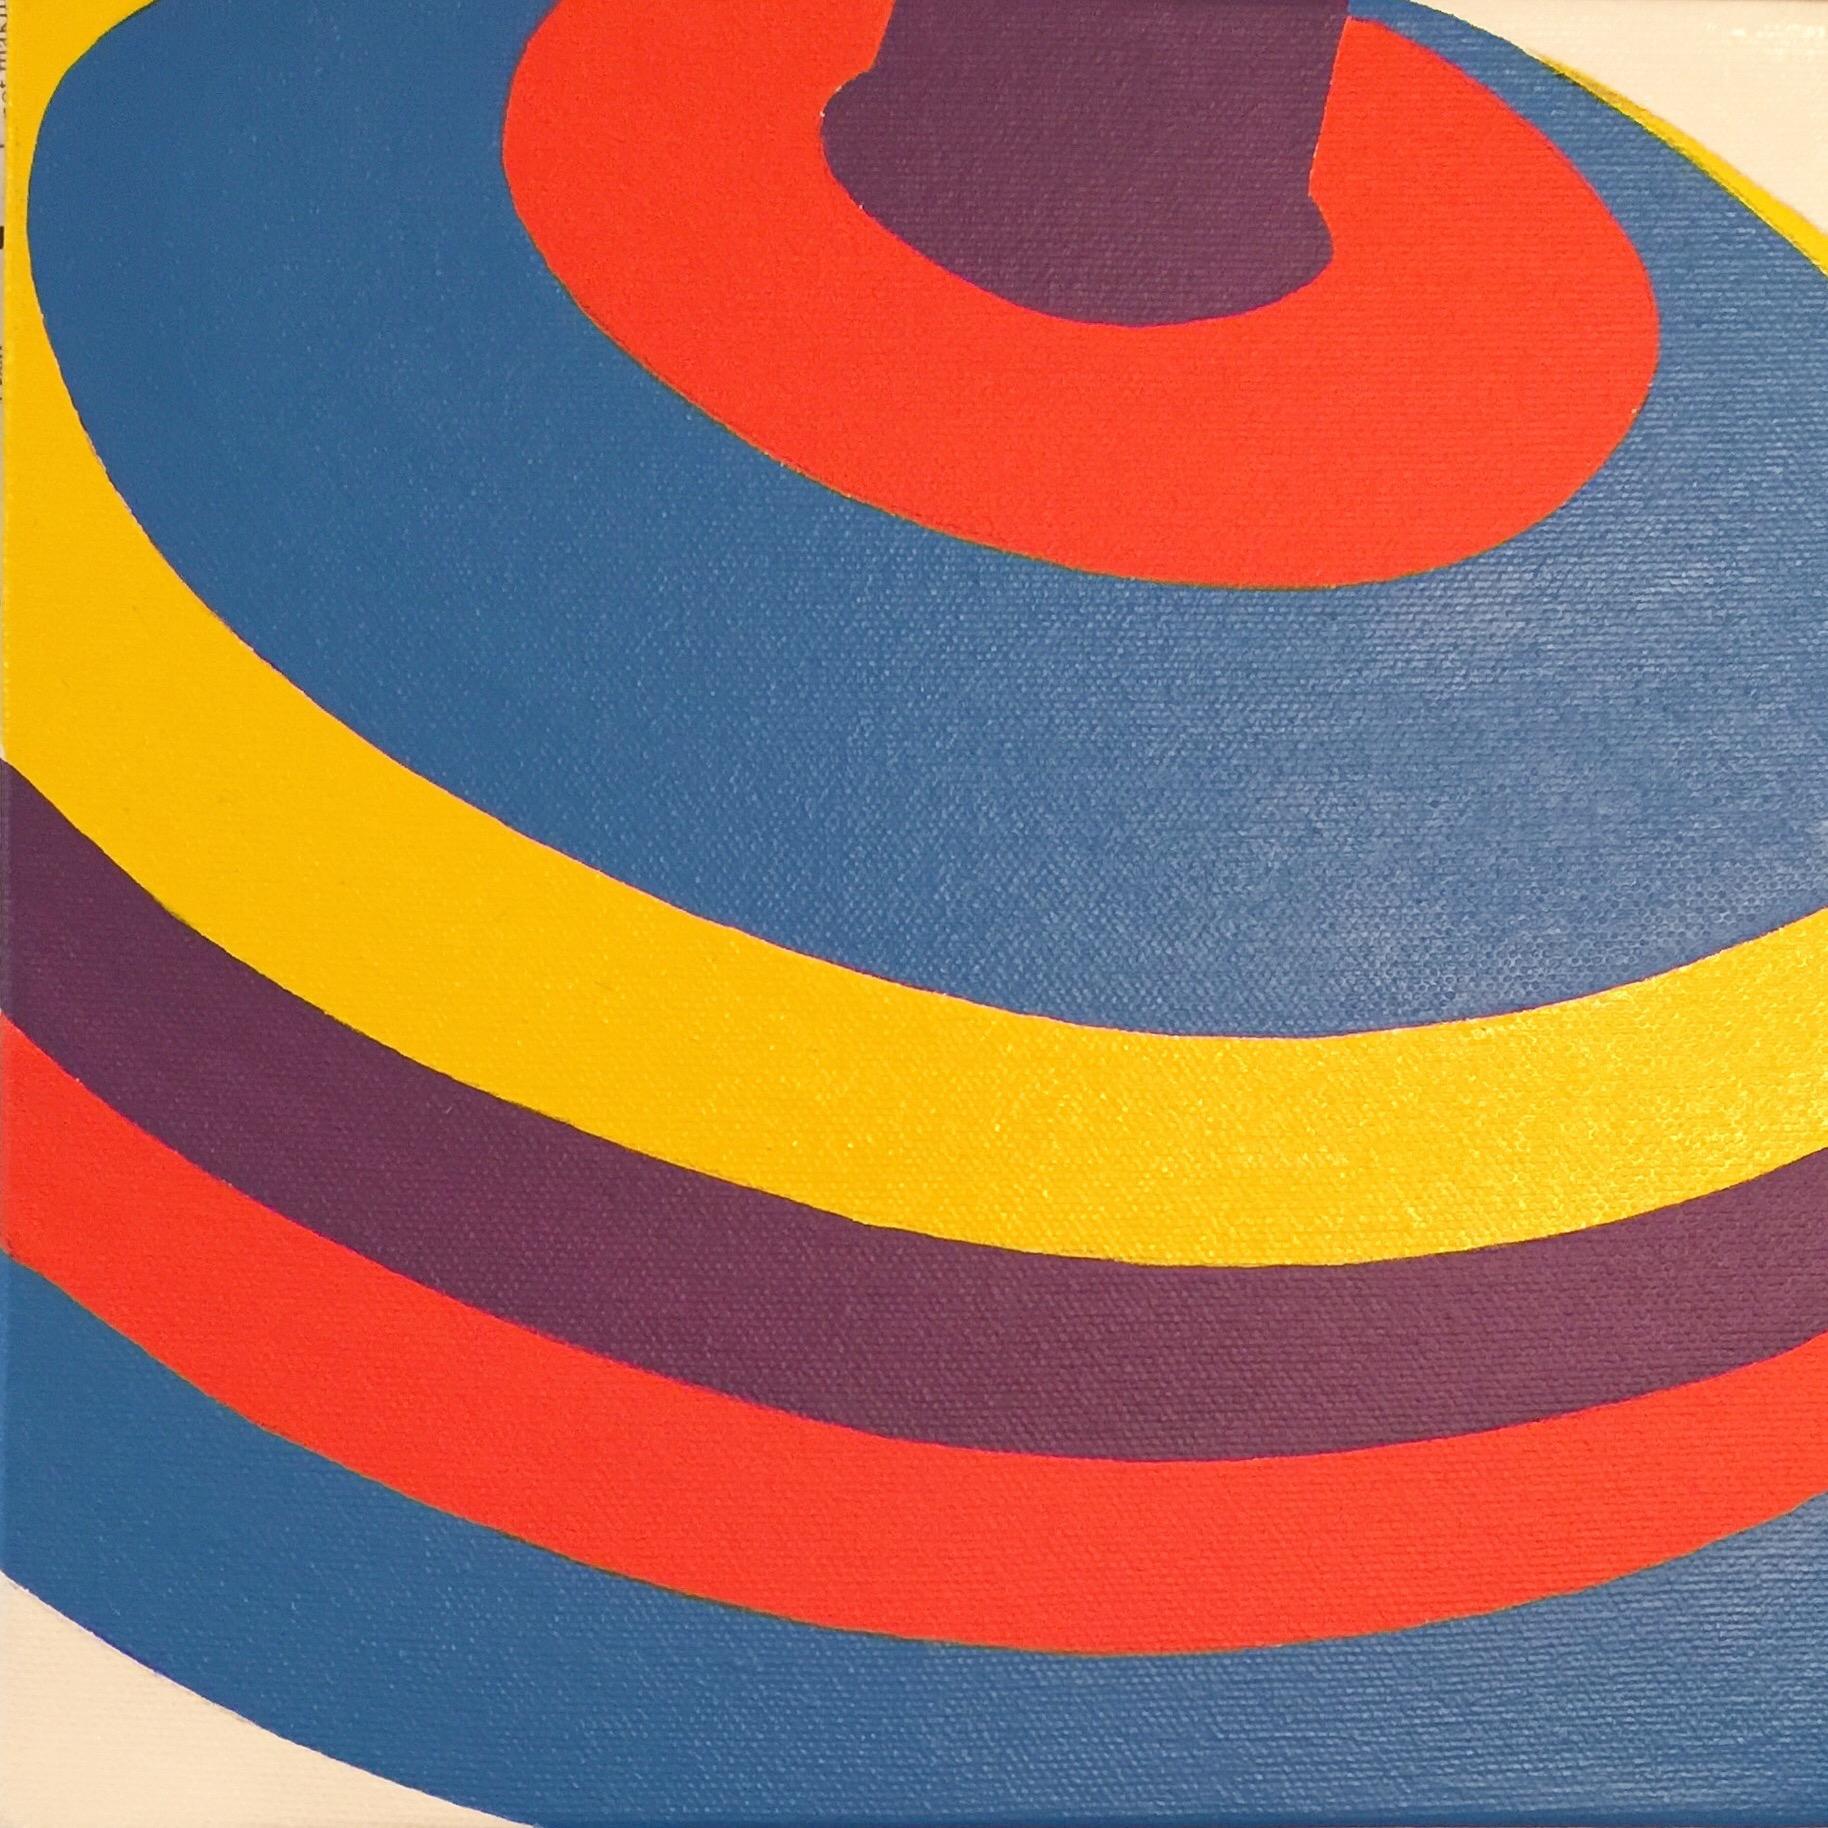 "Top #8 | H. 8"" W. 8"" | Acrylic on canvas | 2016"